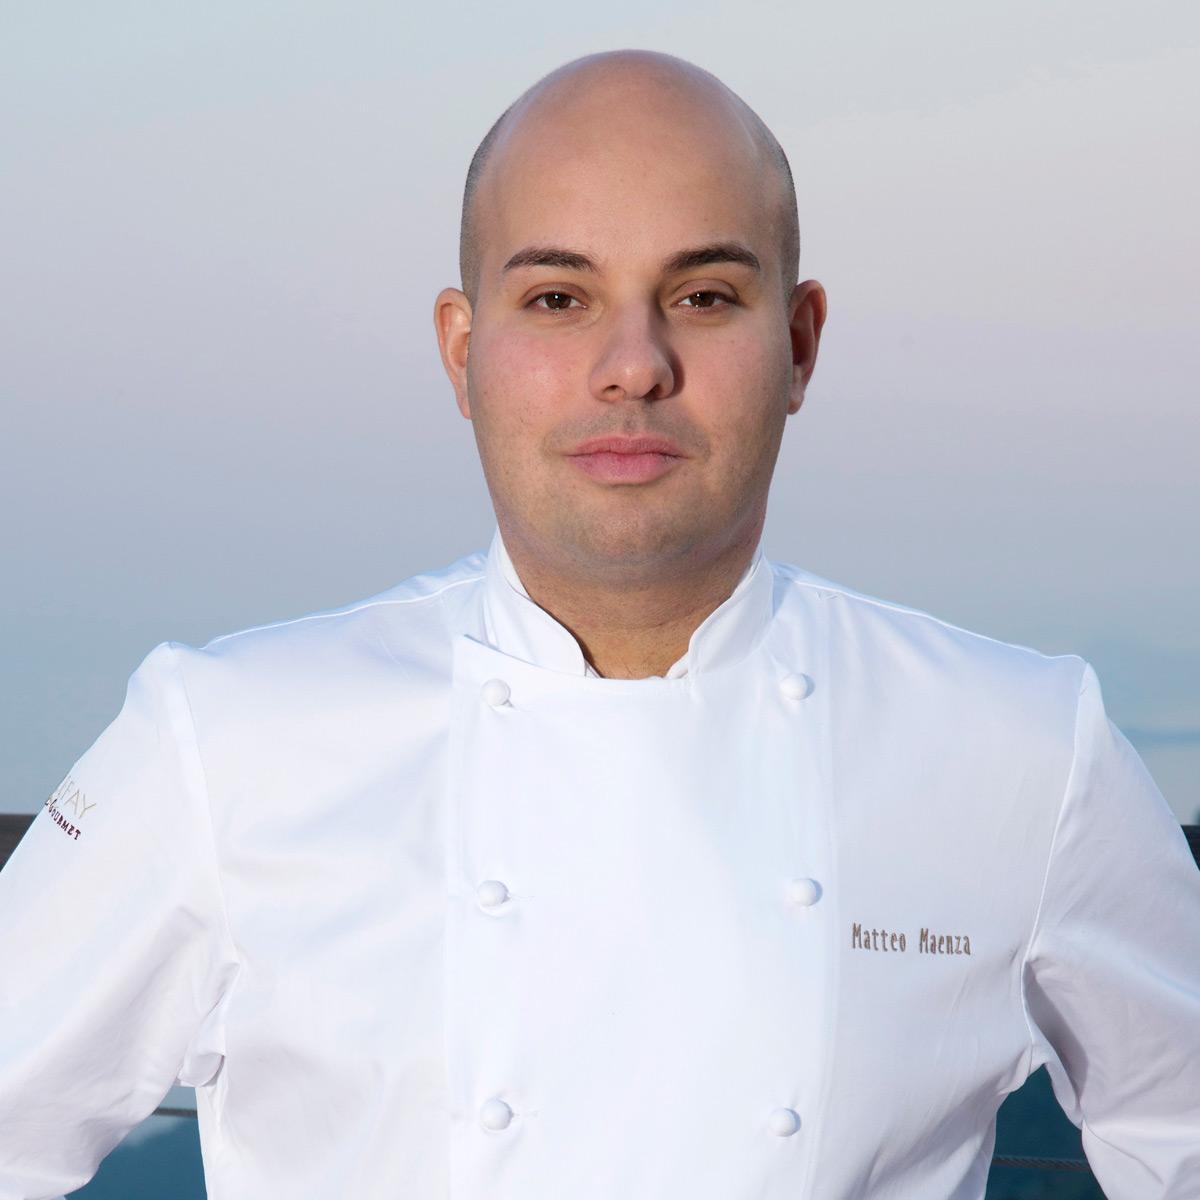 chef-matteo-maenza-2